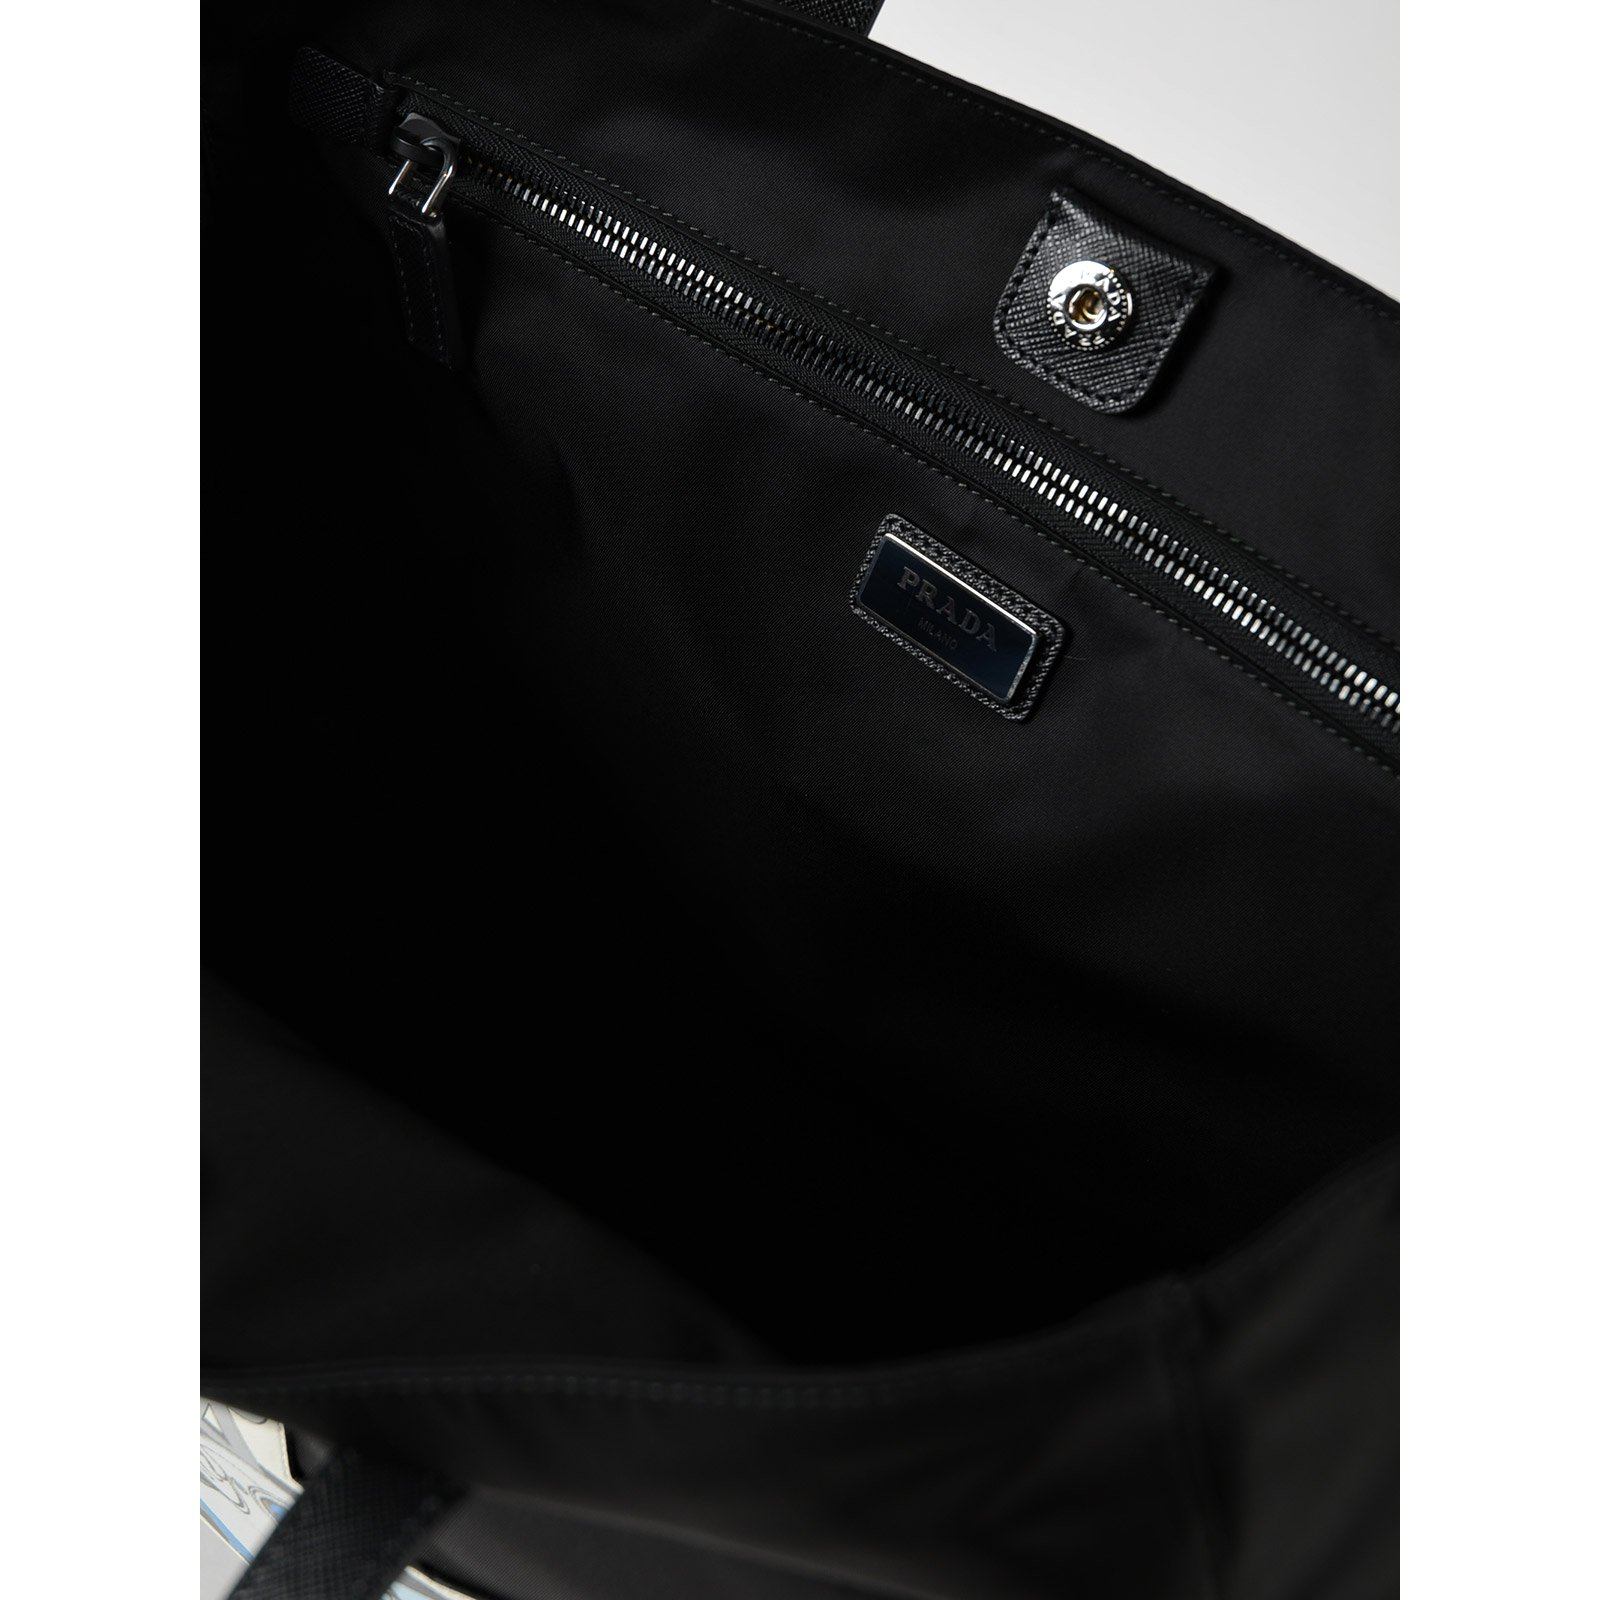 ... Prada Handbags Handbags nylon Black ref.71518 - Joli Closet the latest  98cef 47a19 ... 1199d94b5f